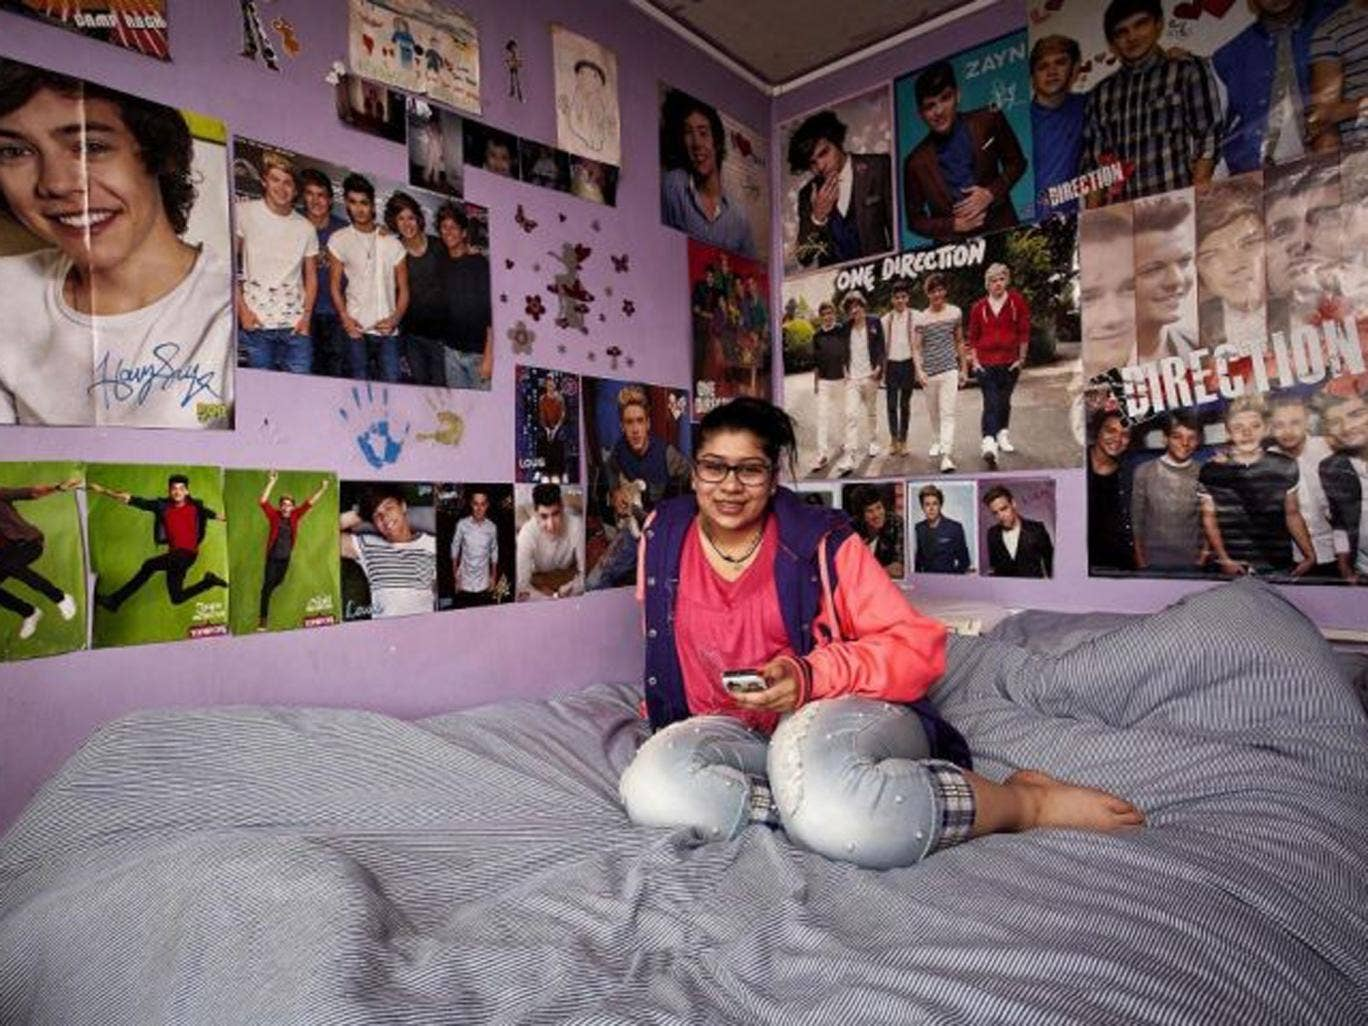 Blanket coverage: One Direction fan Natasha